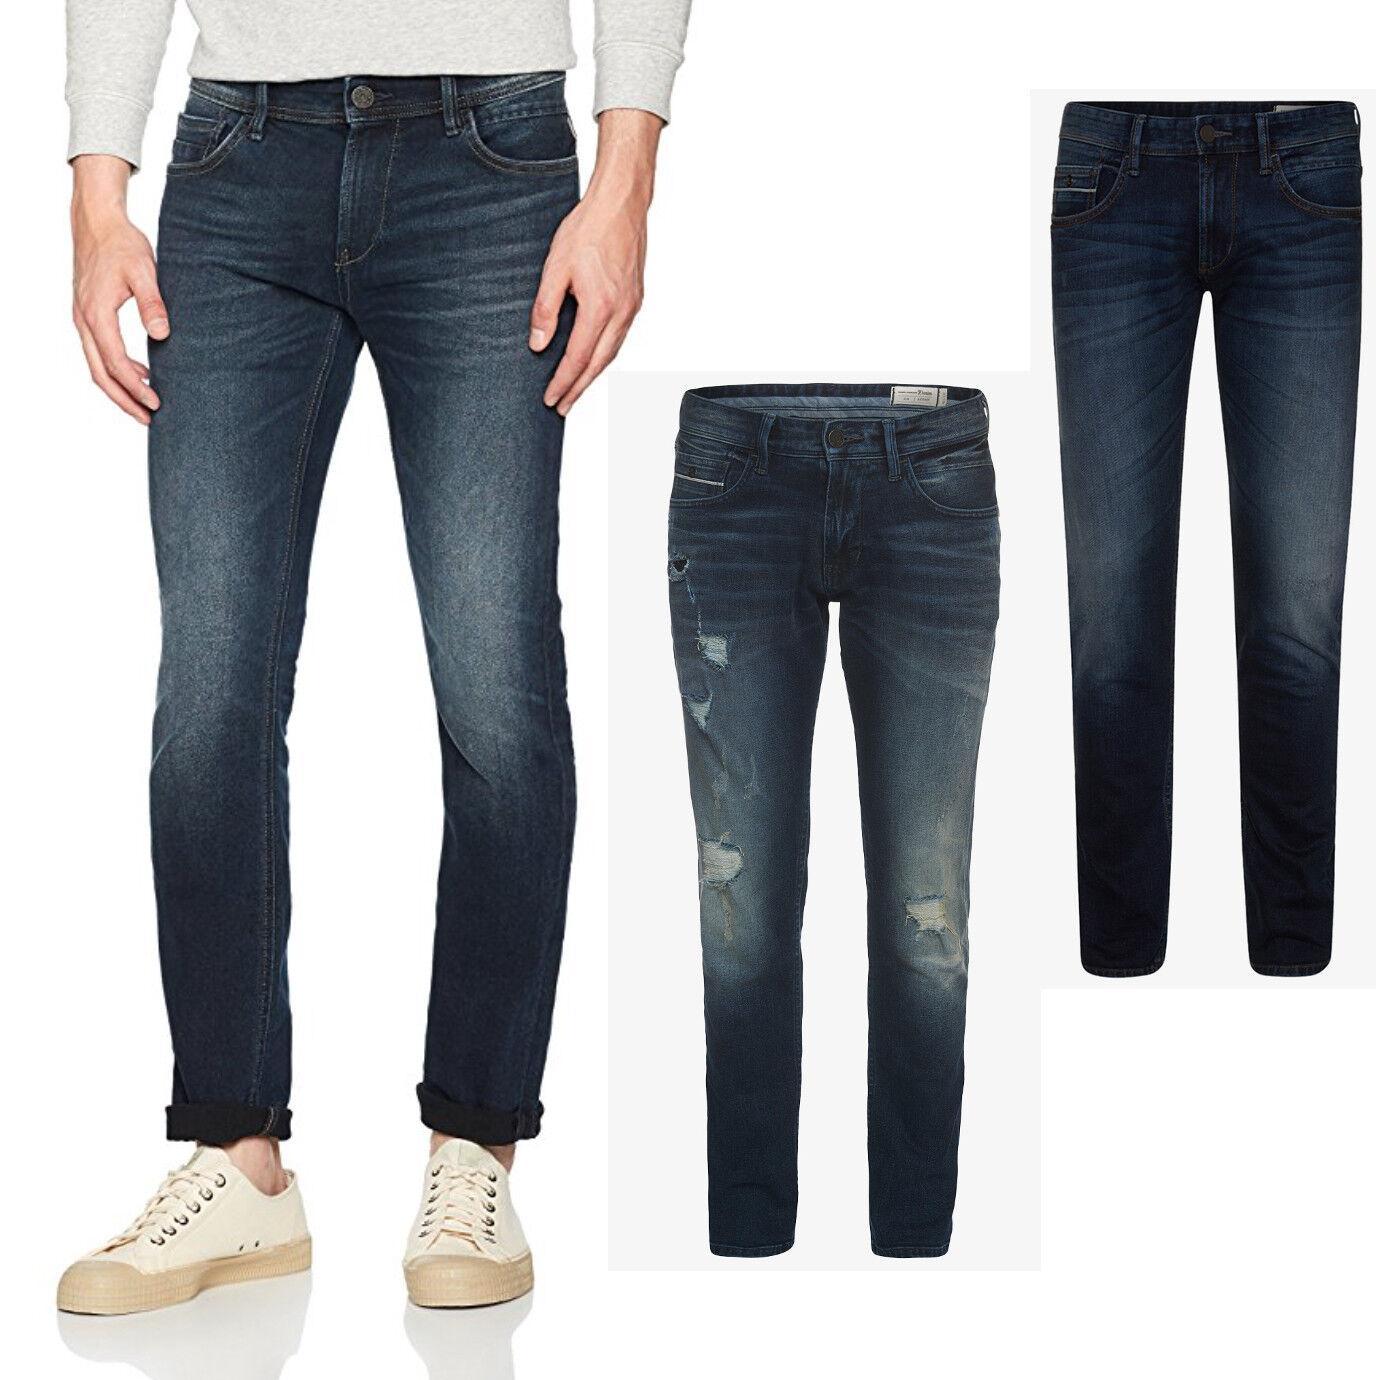 tom tailor men 39 s jeans pants aedan slim skinny fit. Black Bedroom Furniture Sets. Home Design Ideas